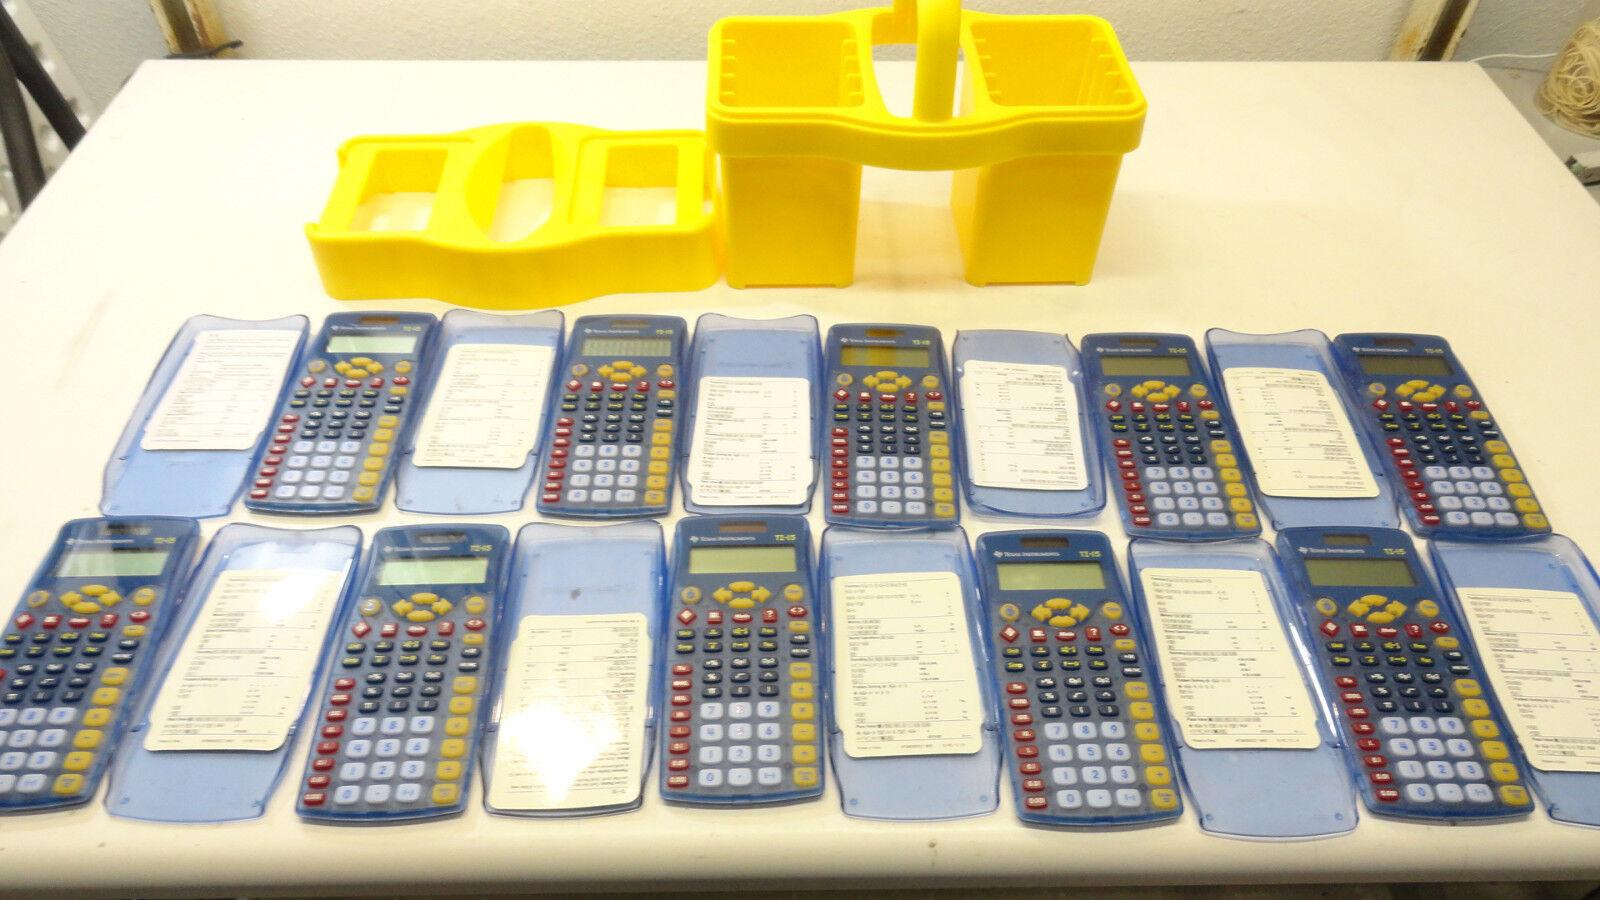 5x Texas Instruments TI-15 Explorer Scientific Calculator- No  case Included